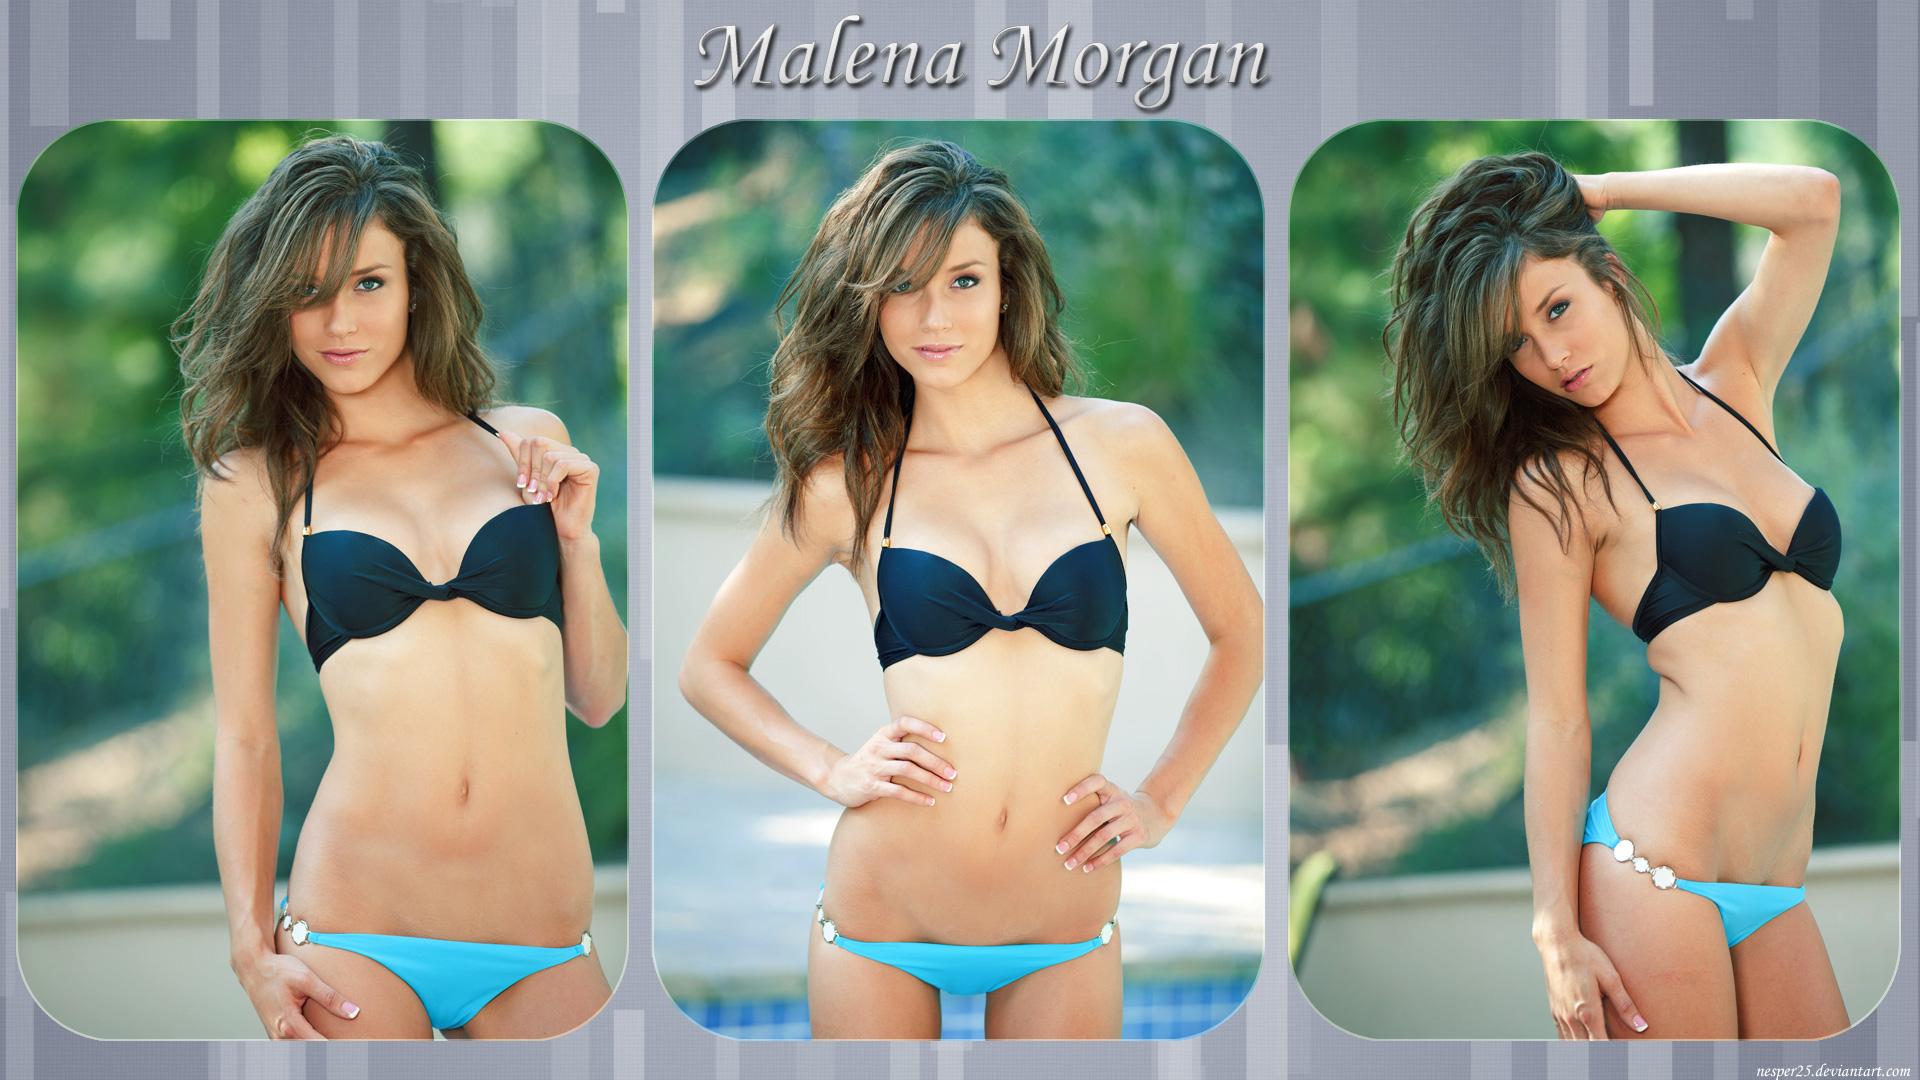 Malena Morgan Wallpaper 1920x1080 by Nesper25